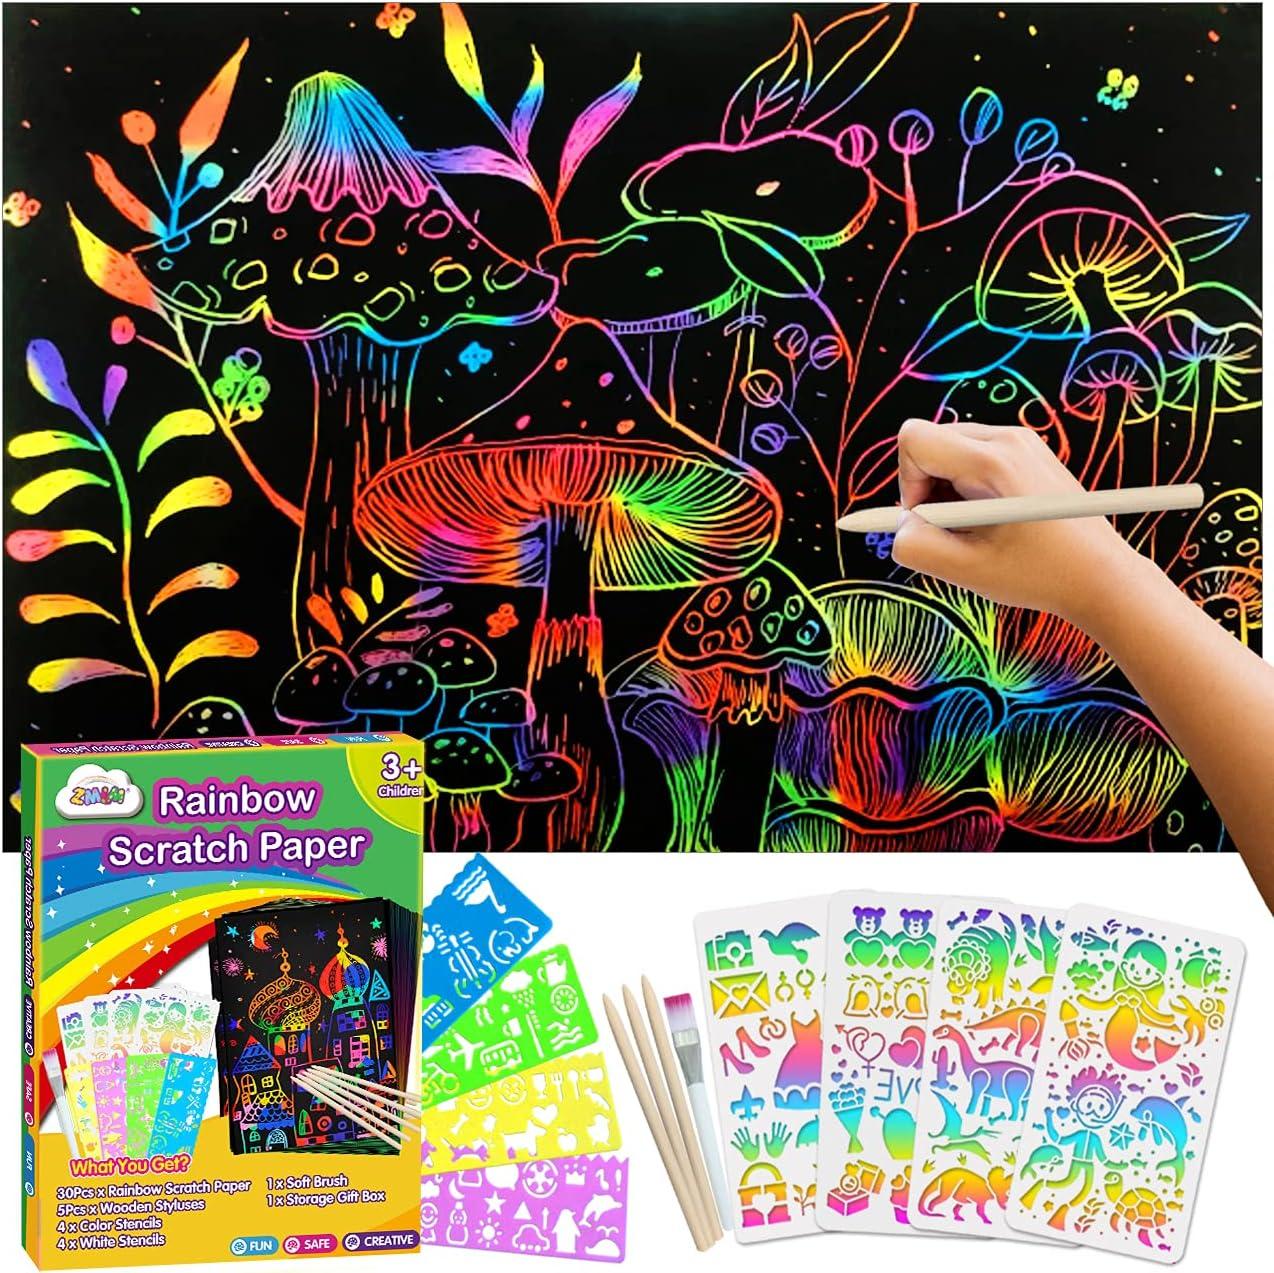 Genuine Free Shipping ZMLM Scratch Paper Art-Craft Kit: 11''x 8'' Branded goods Magic Sheets Rai Big